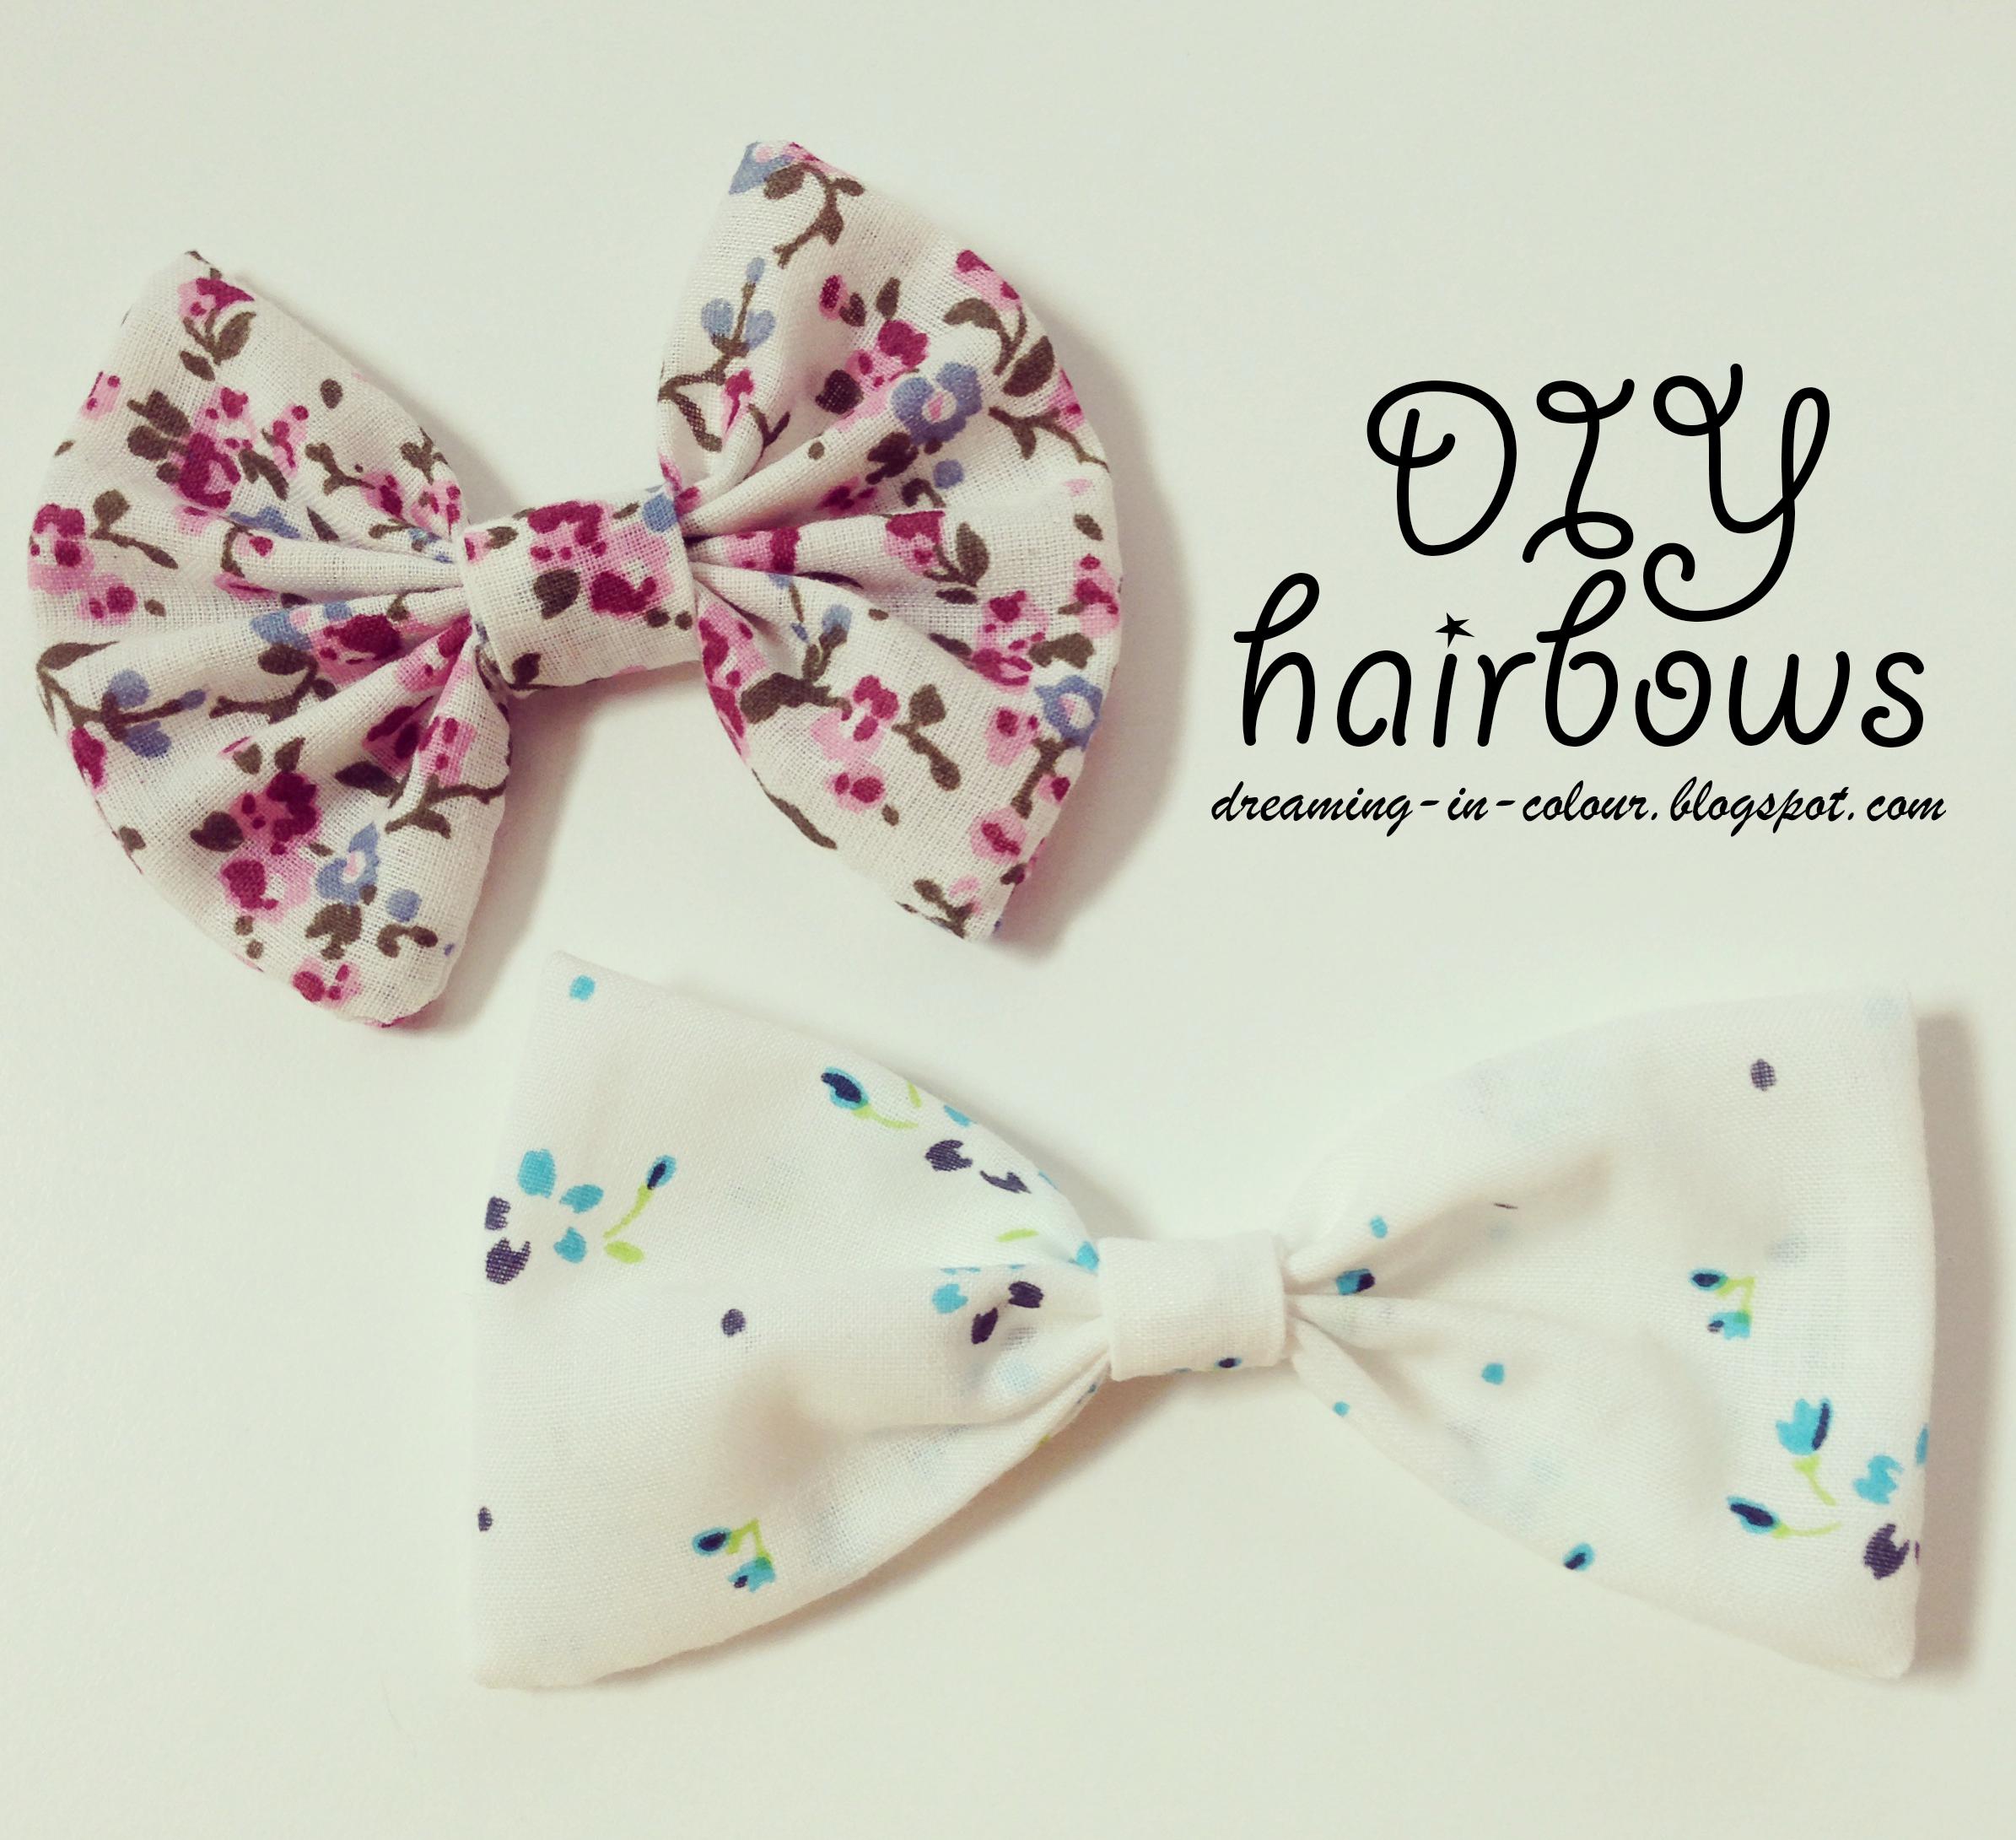 diy hair bows tutorial - sew or glue with fabric